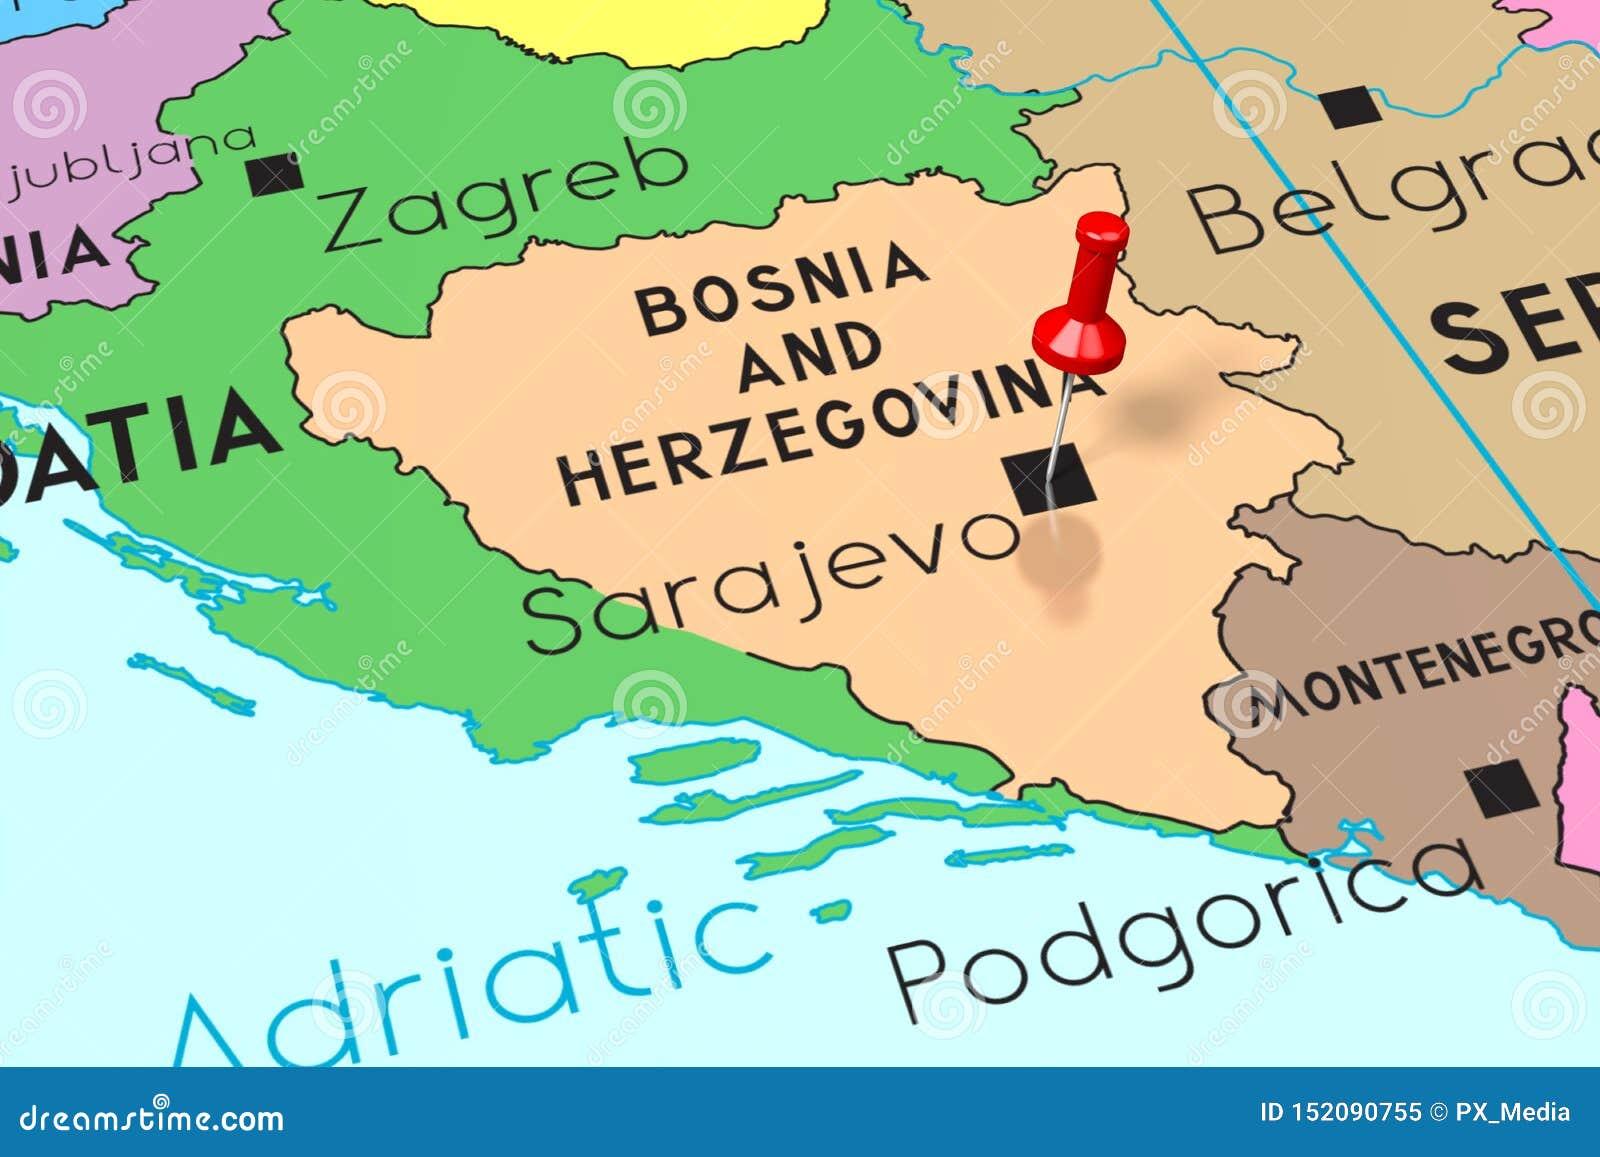 Bosnia And Herzegovina Sarajevo Capital City Pinned On